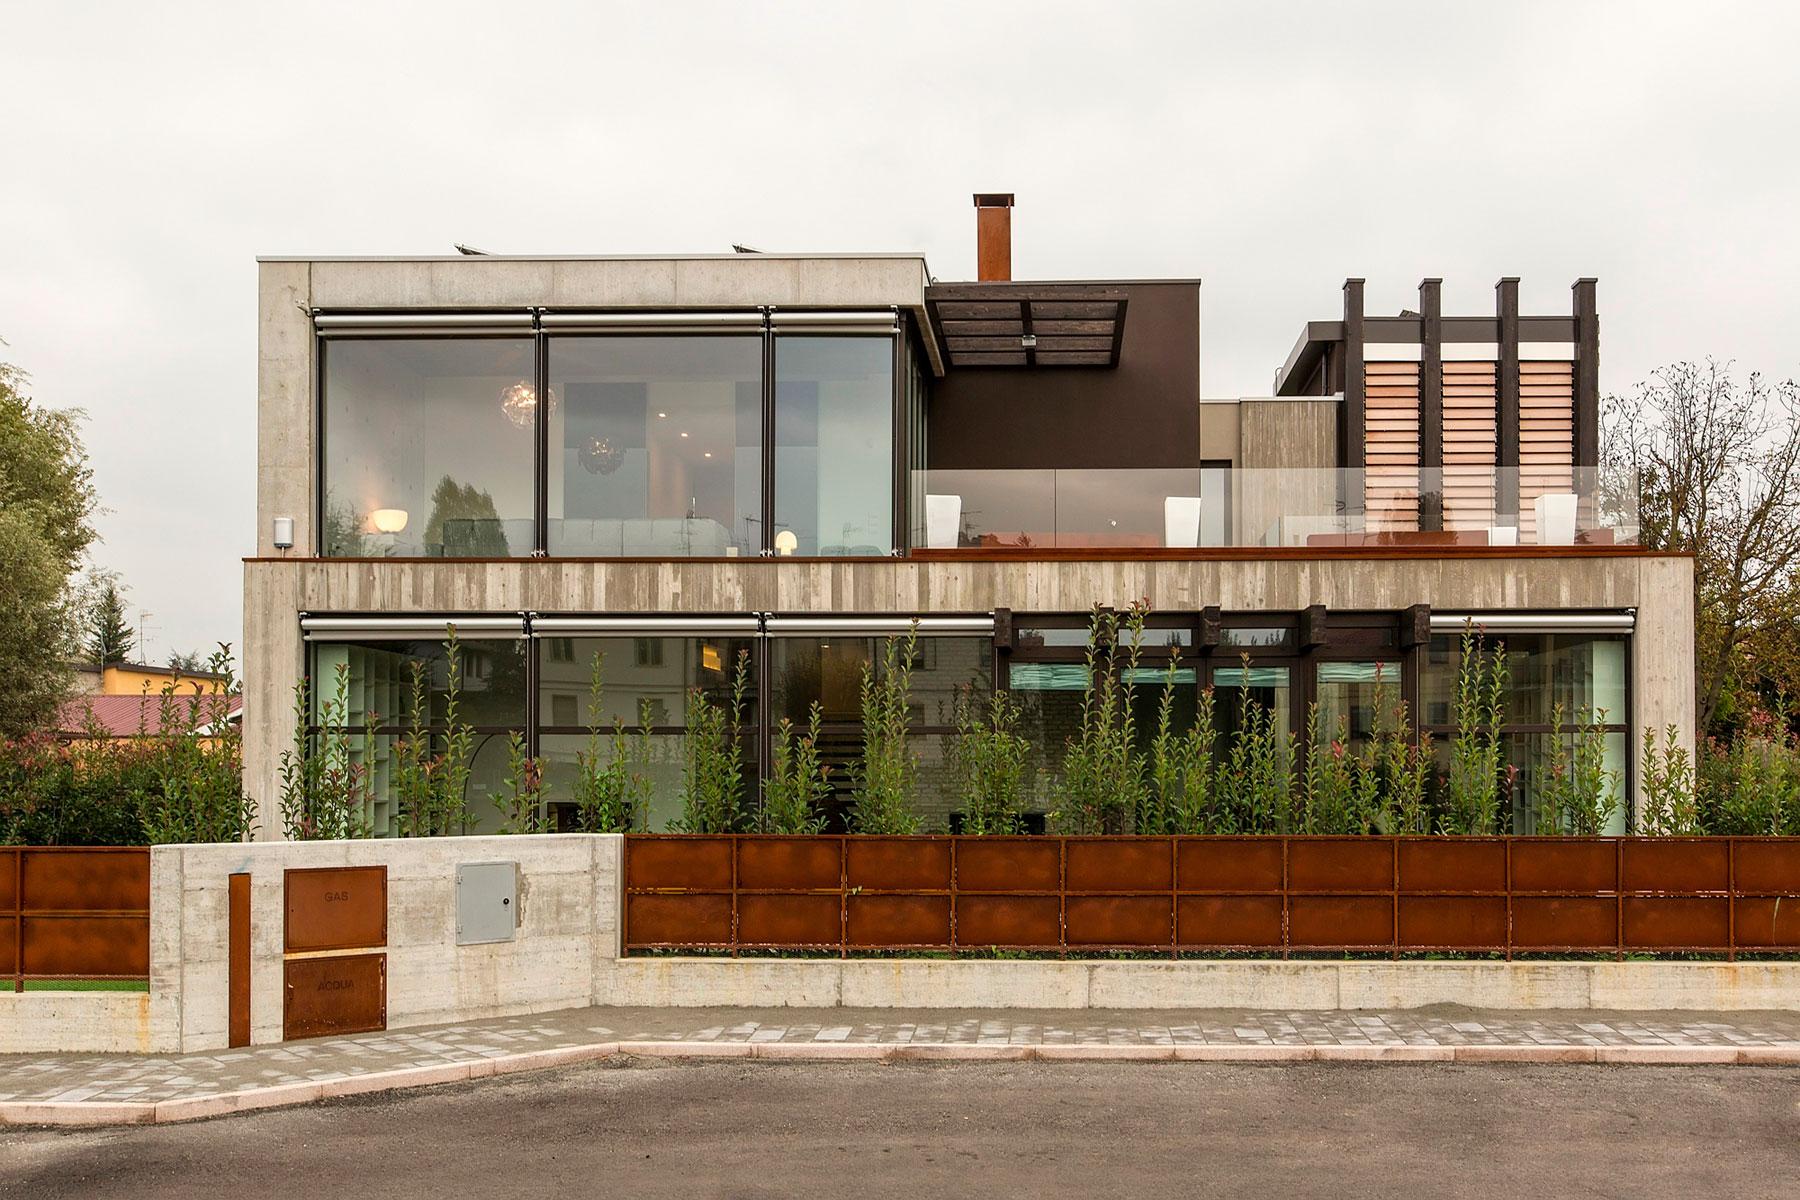 D'Autore Residence near Bologna by Giraldi Associati Architetti-01